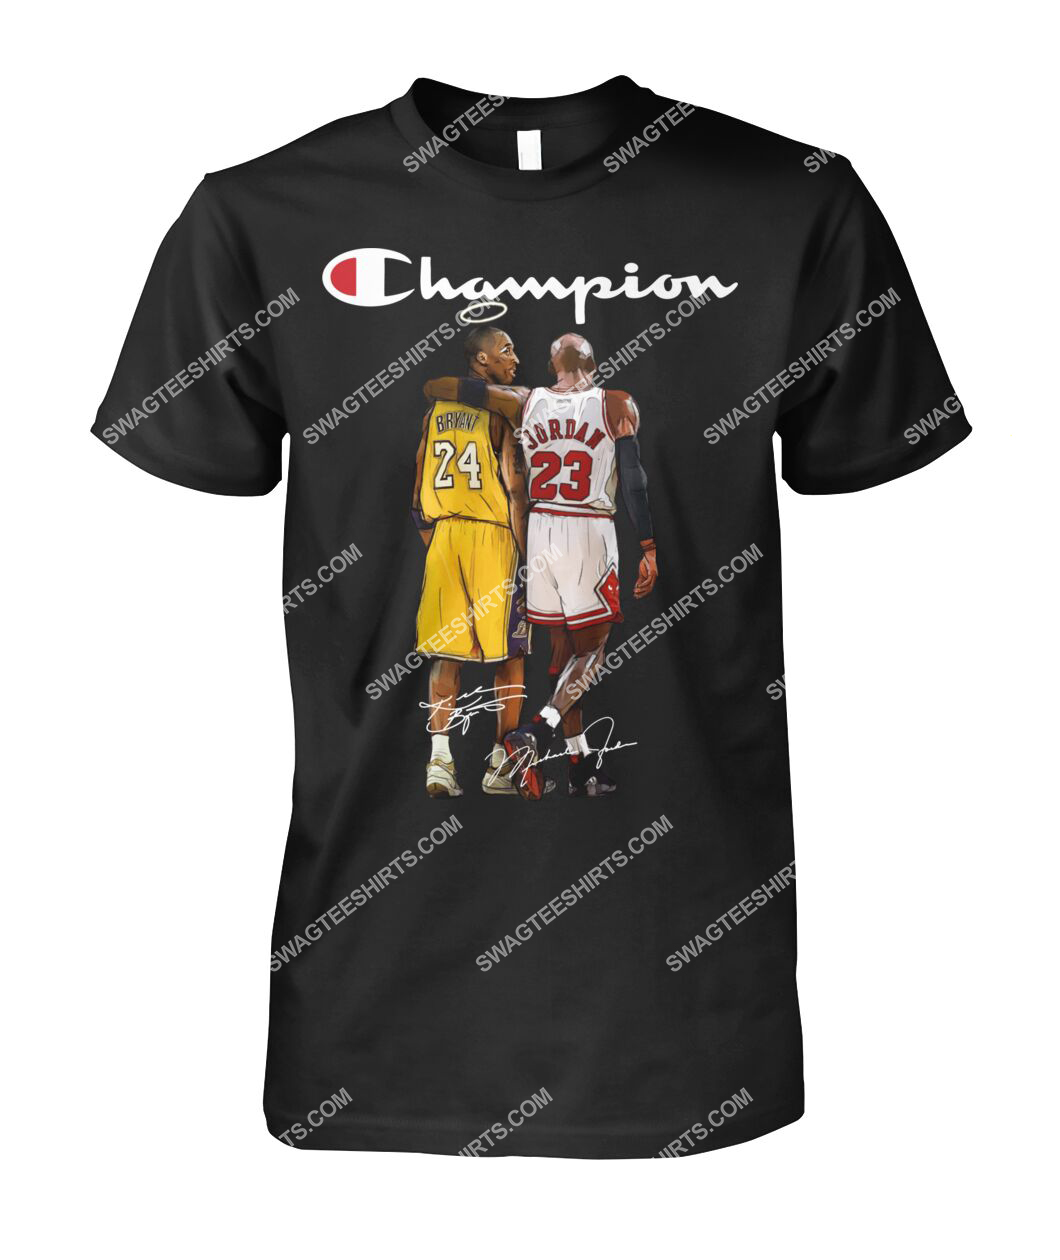 champion kobe bryant and michael jordan signature tshirt 1